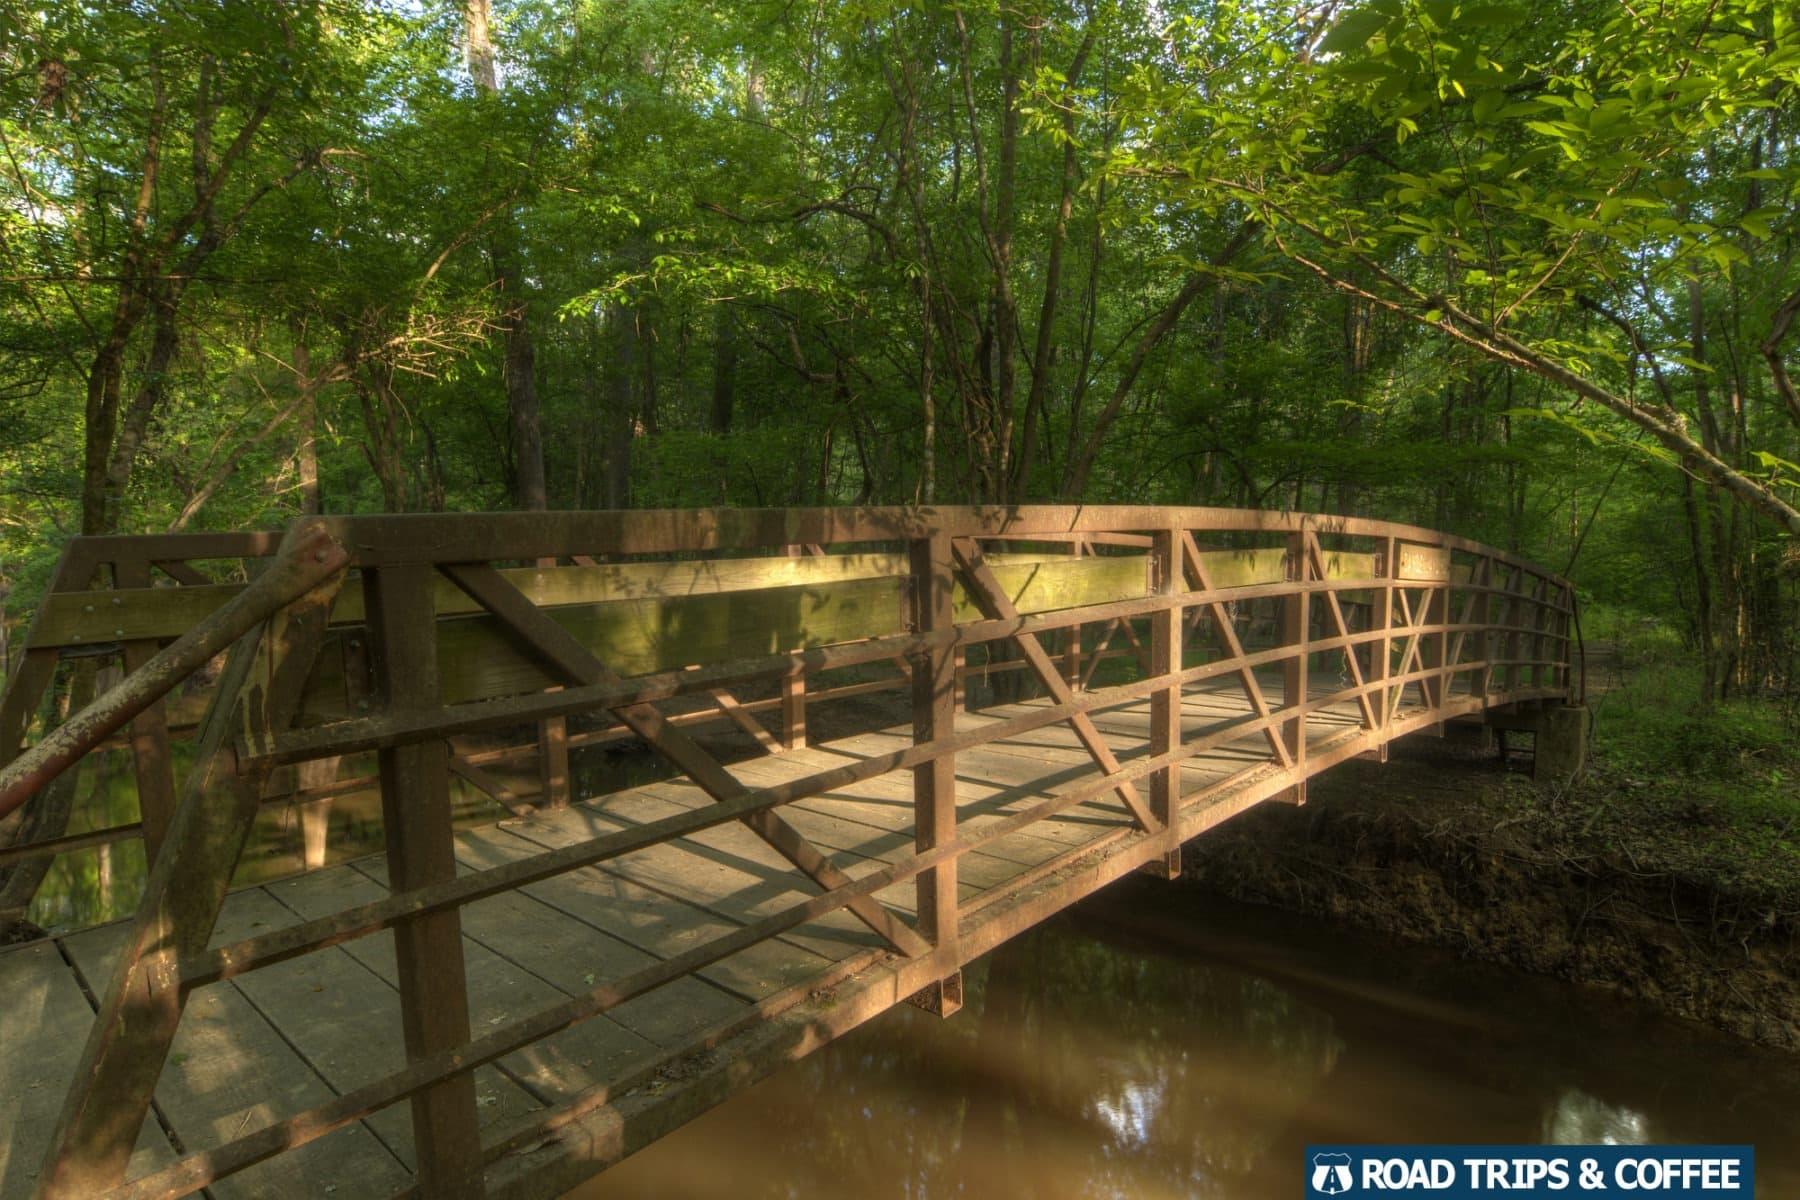 A wooden footbridge crossing Cedar Creek along the Kingsnake Trail in Congaree National Park in South Carolina